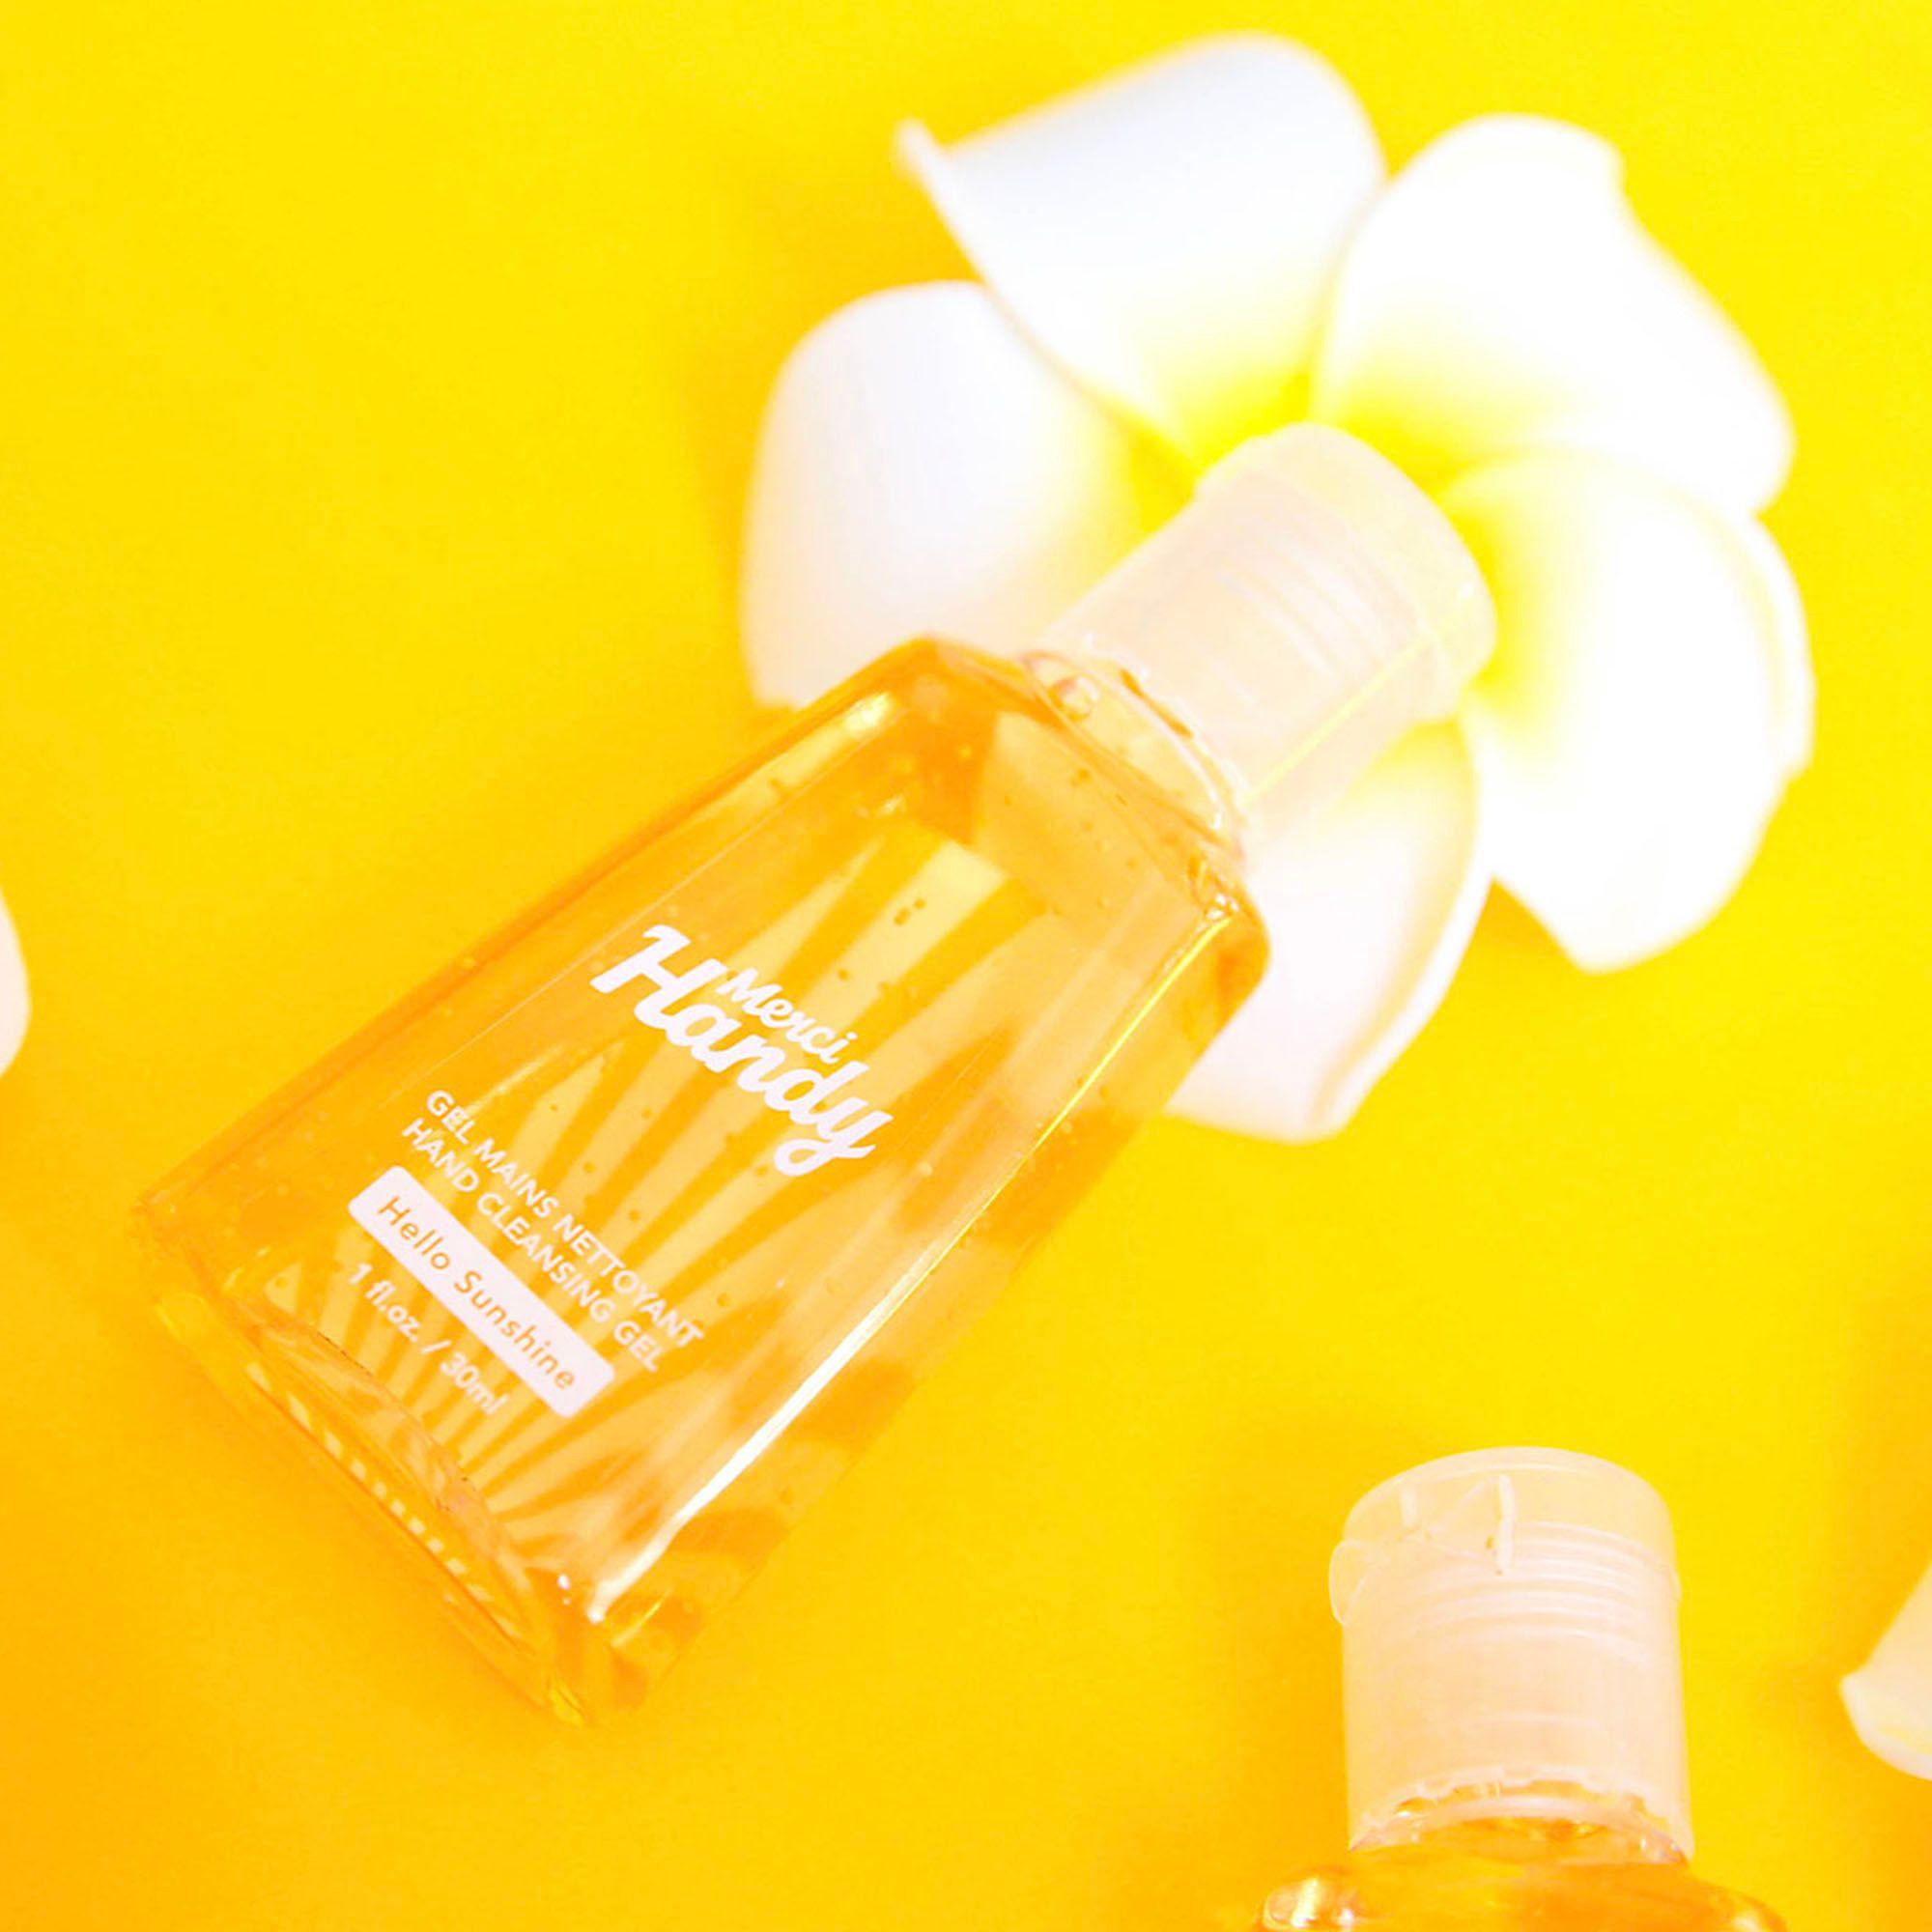 Blissim : Merci Handy - Gel nettoyant mains - Hello Sunshine